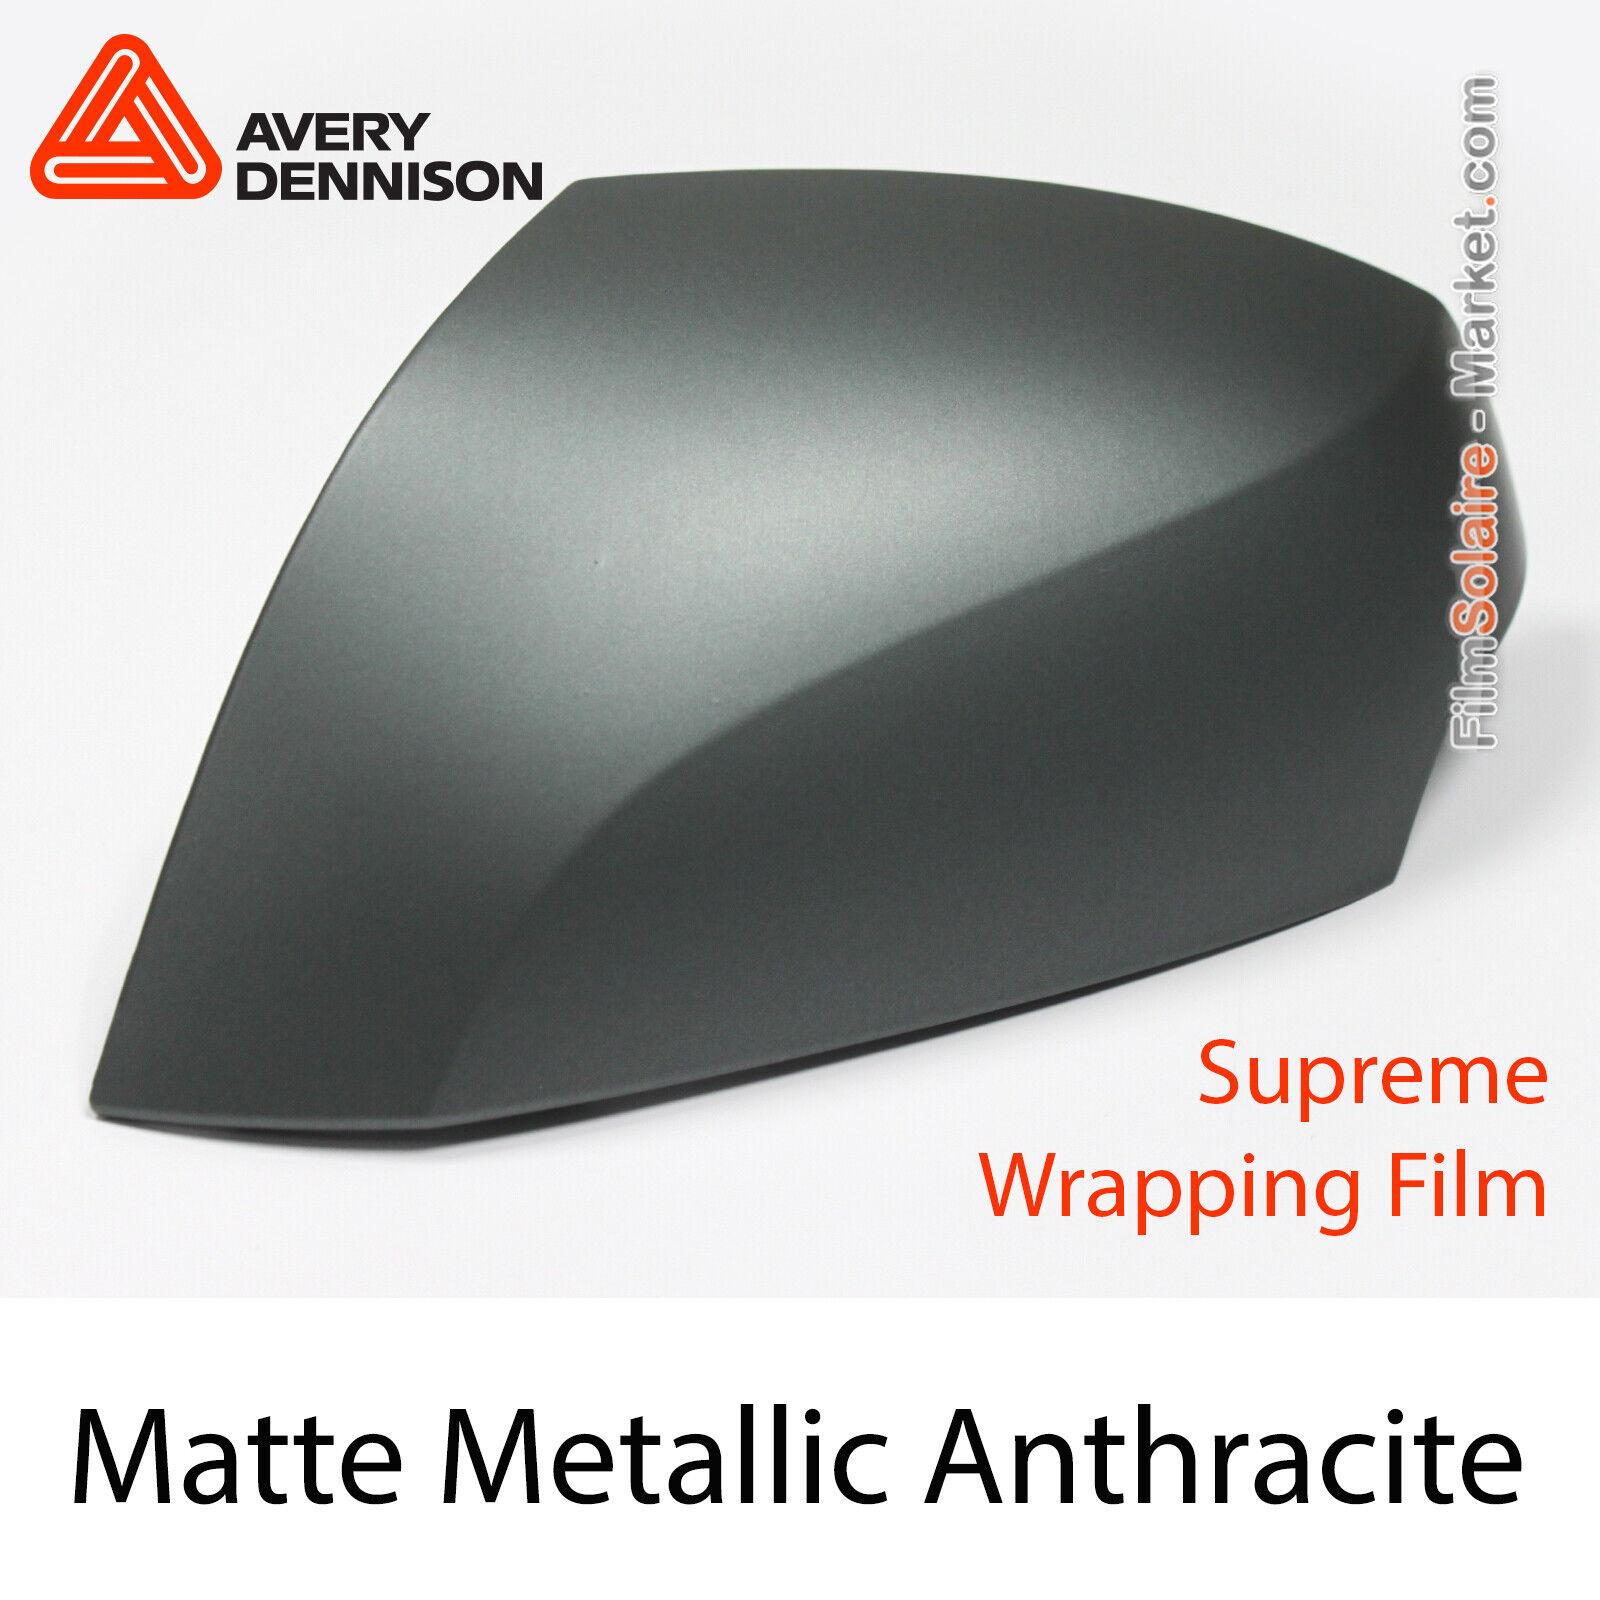 Matt Metallic Anthrazit, Avery Dennison Supreme Wrapping Folie, Ap2280001